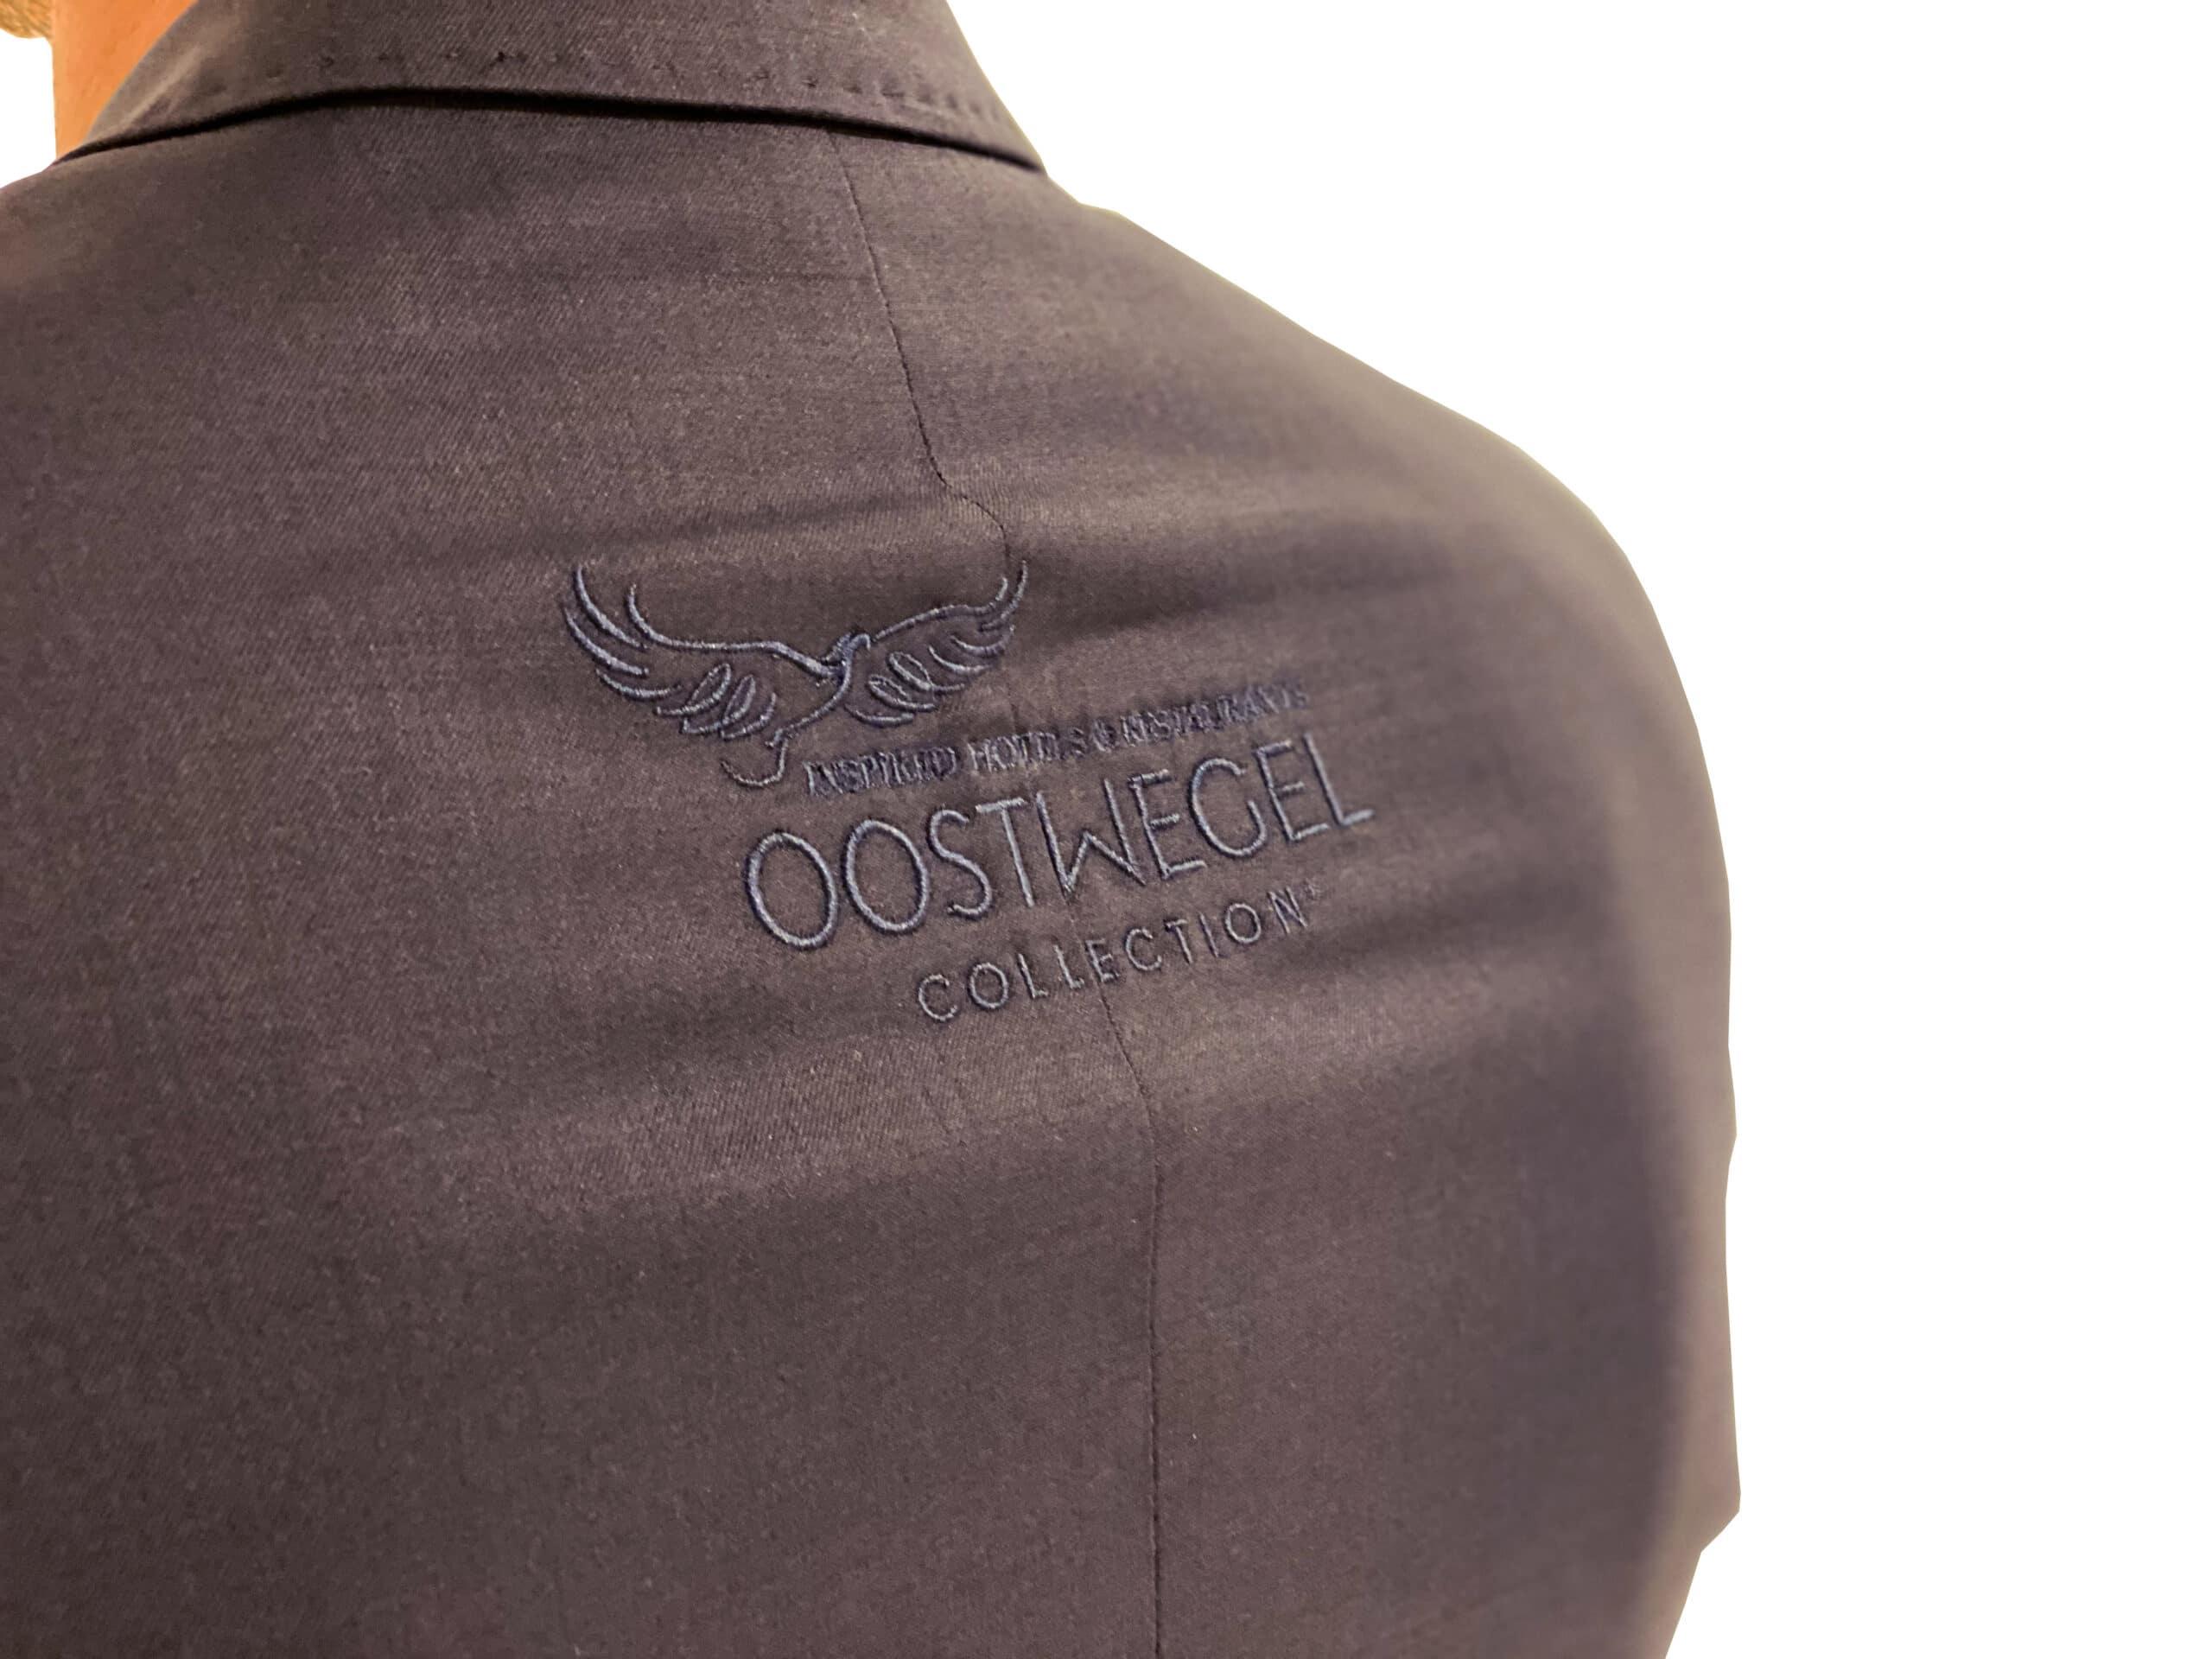 ton-sur-ton-logo-bedrukken-bedrijfskleding